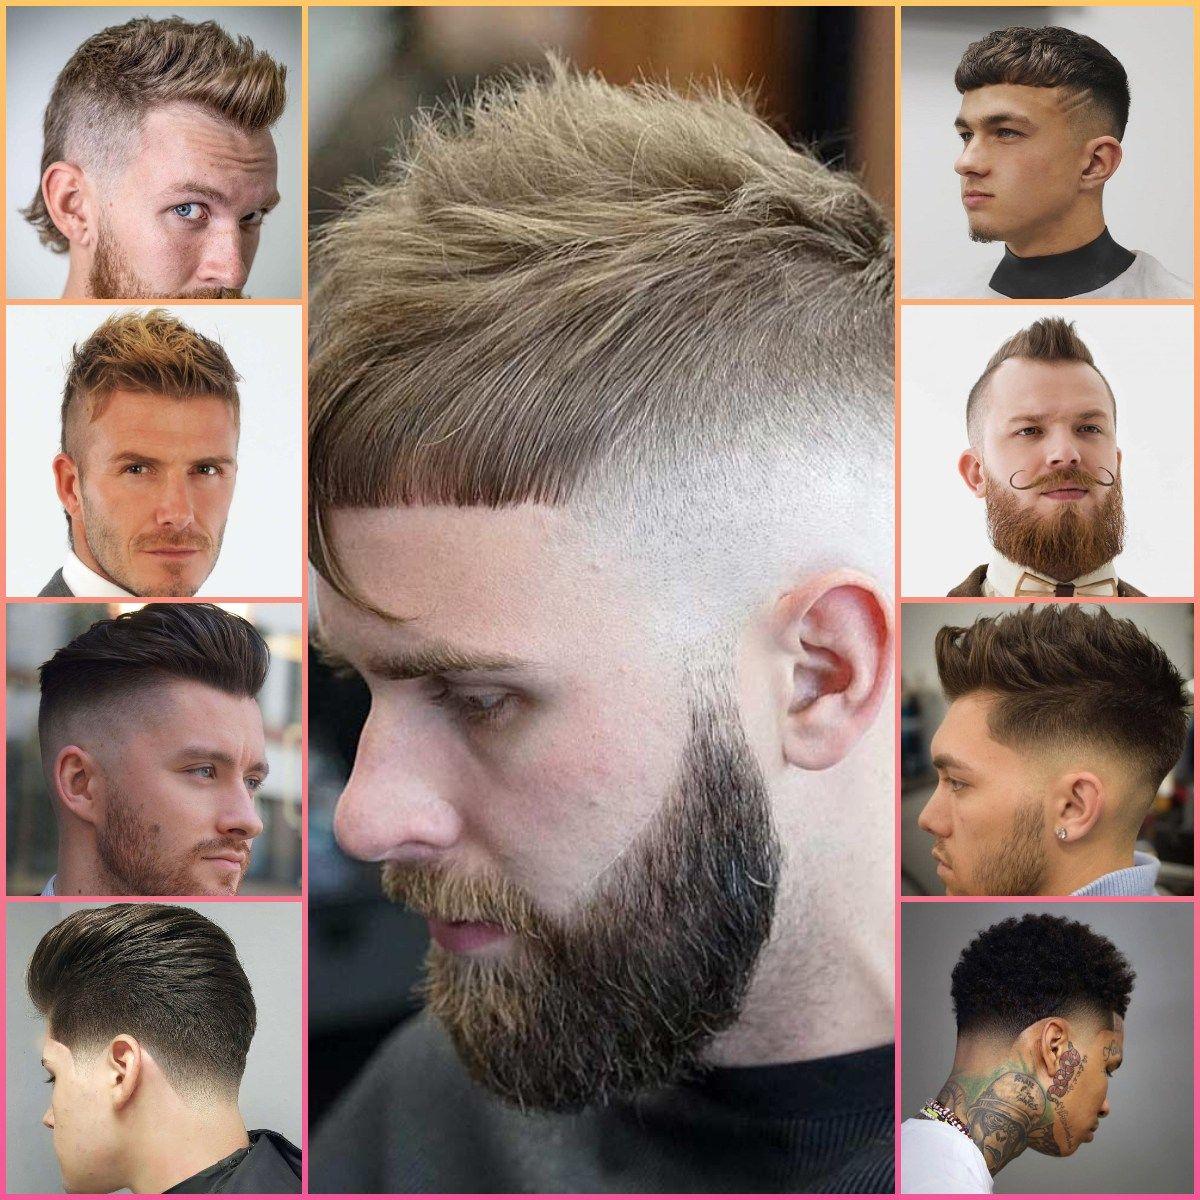 Very Simple Men Short Haircuts Images 2020 New Trending Hairstyles Ideas In 2020 Mens Hairstyles Medium Haircut Images Mens Haircuts Short